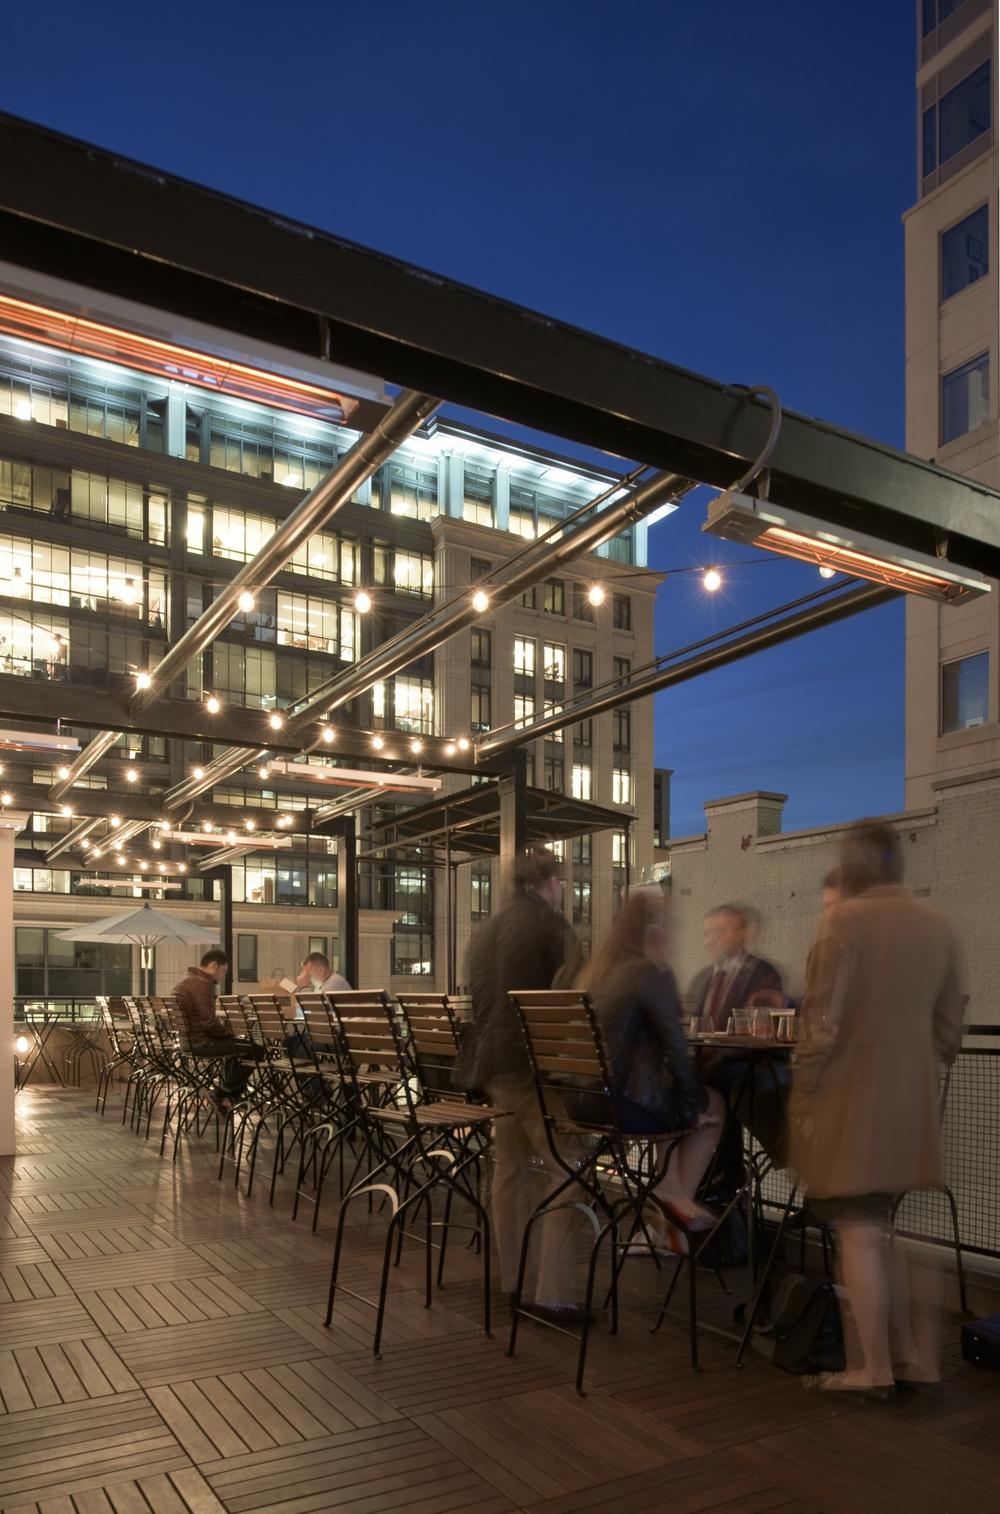 Bar Deco_2 (2).jpg